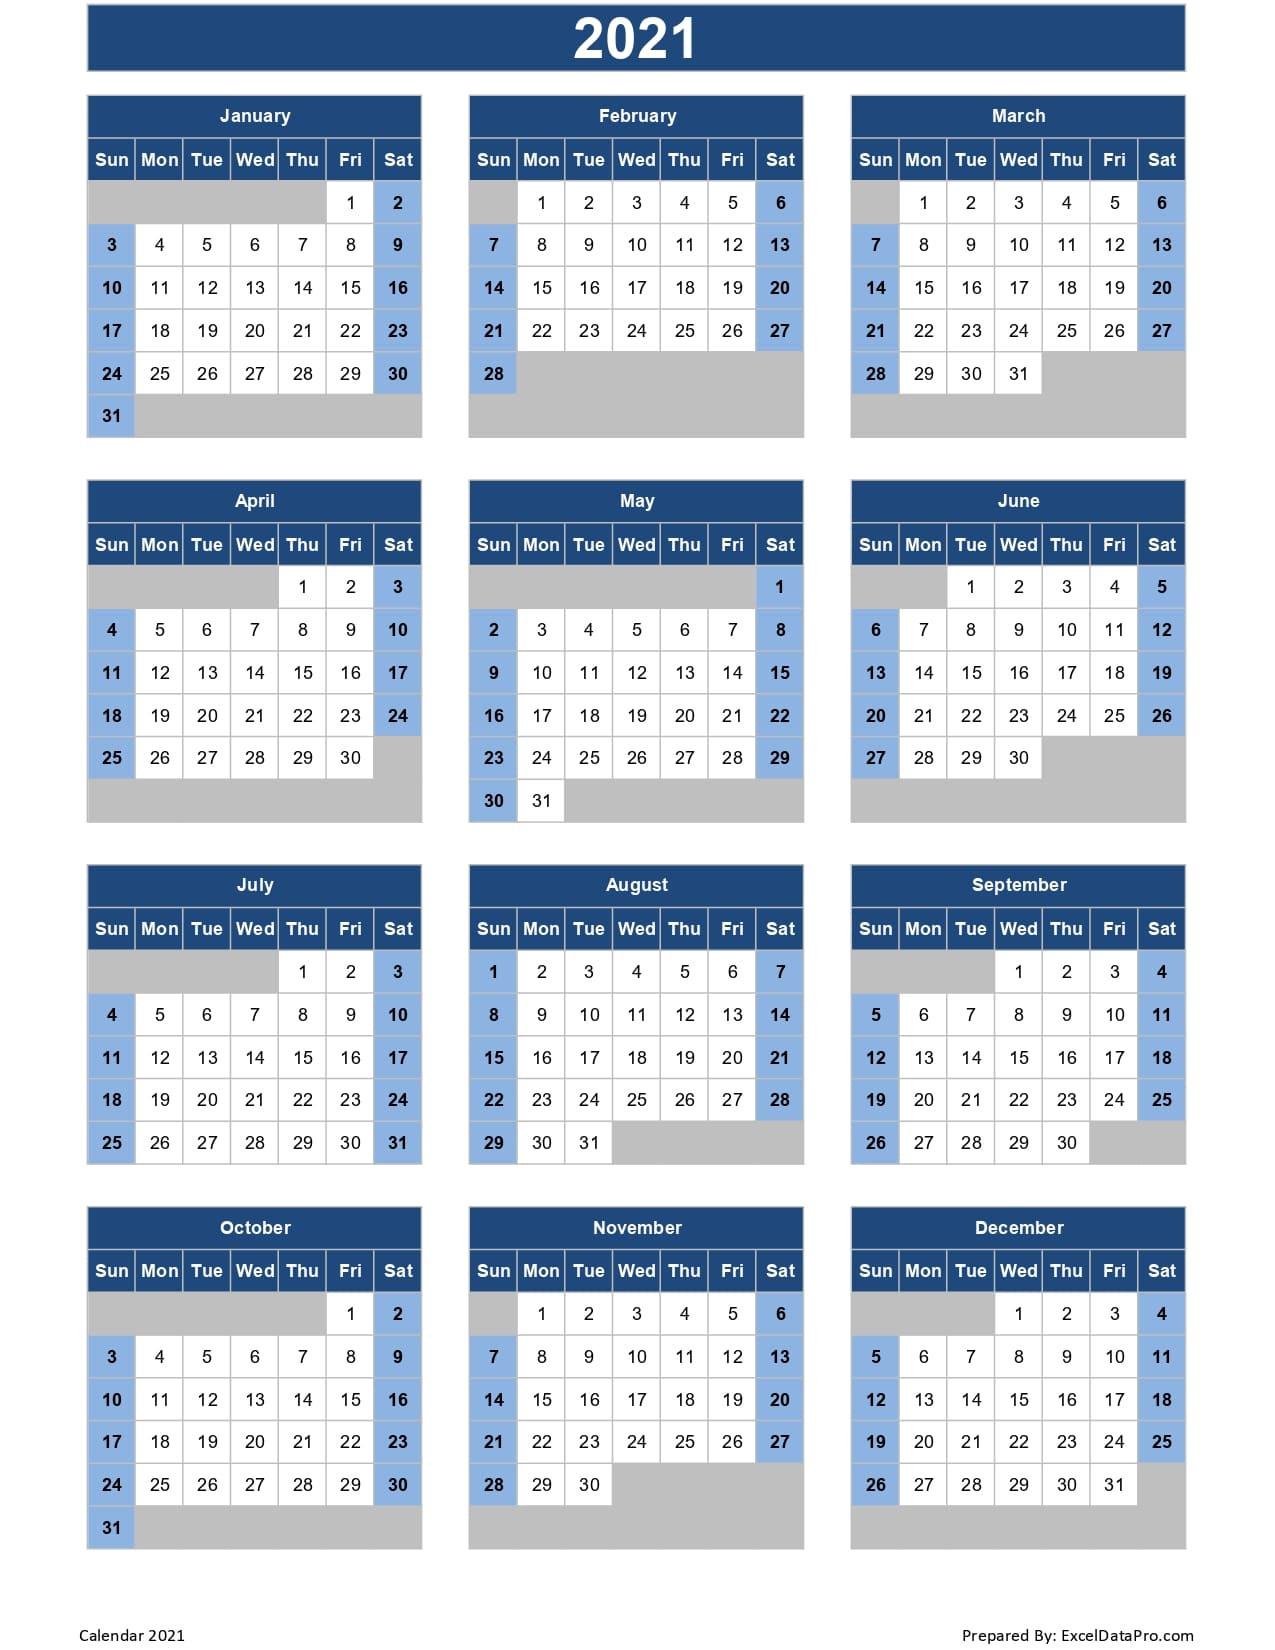 Calendar 2021 Excel Templates, Printable Pdfs & Images-2021 Calendar Squares To Rpint